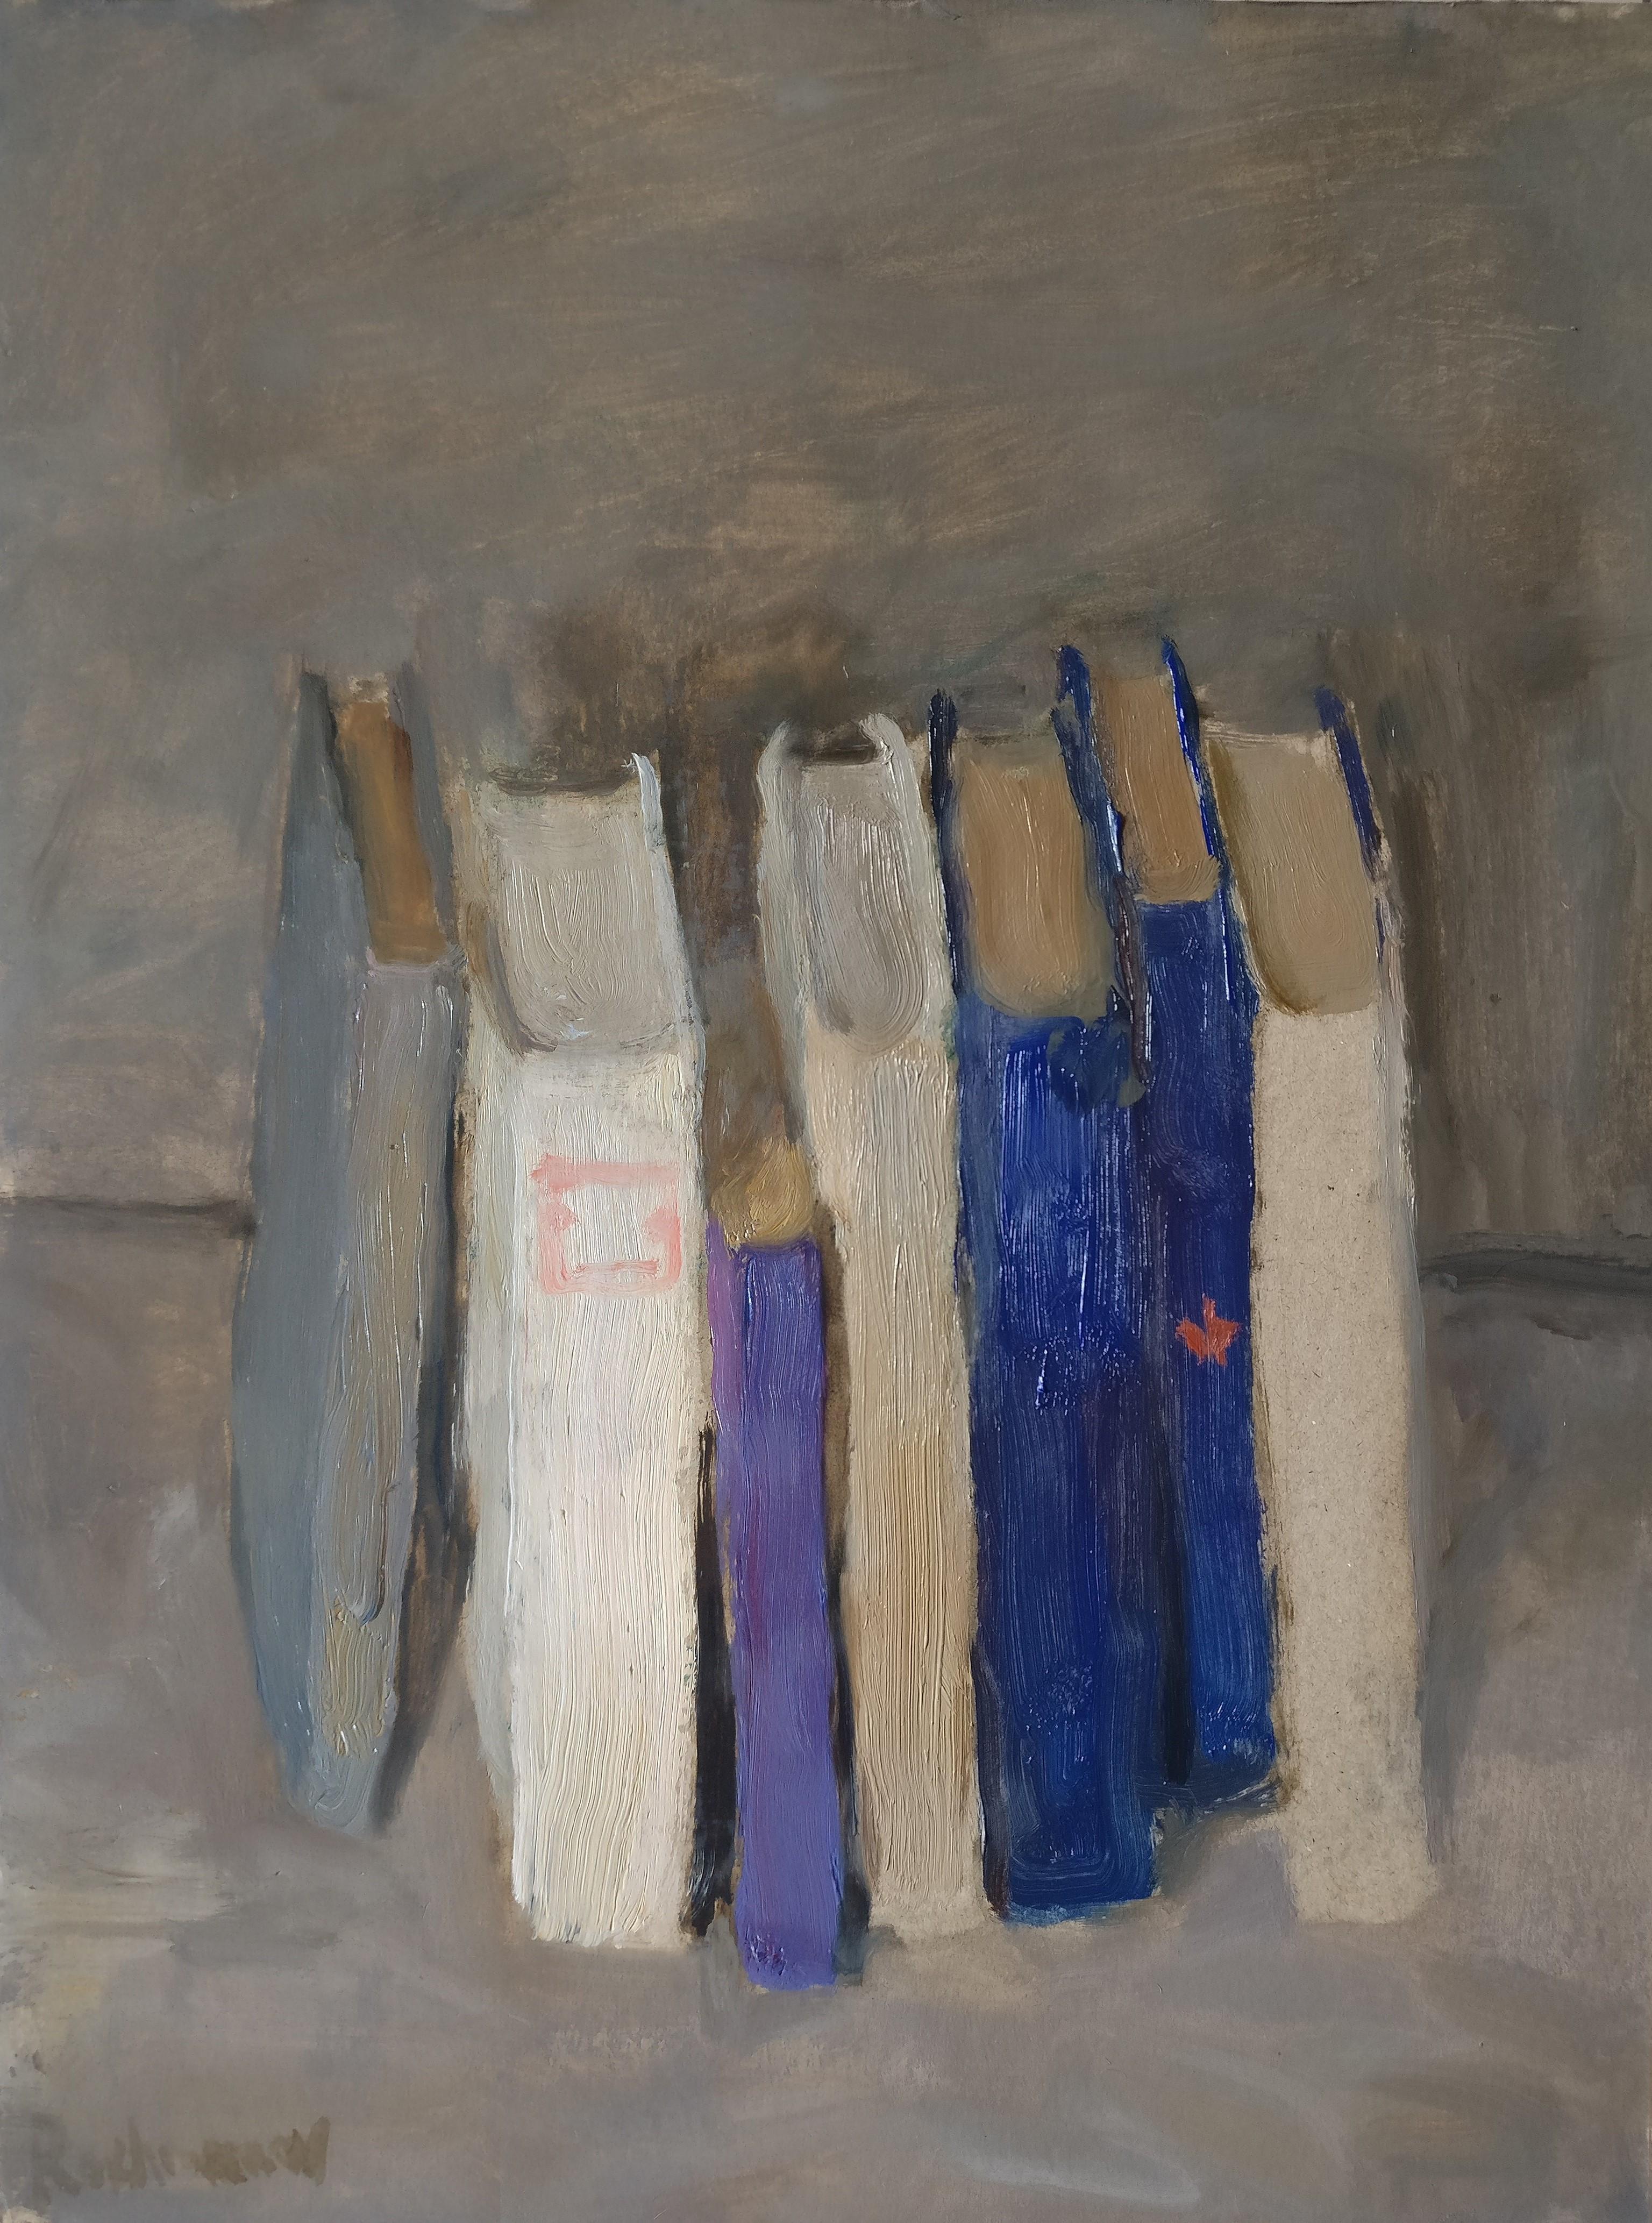 Still Life With Books - Samir Rakhmanov 21st Century Contemporary Oil Painting